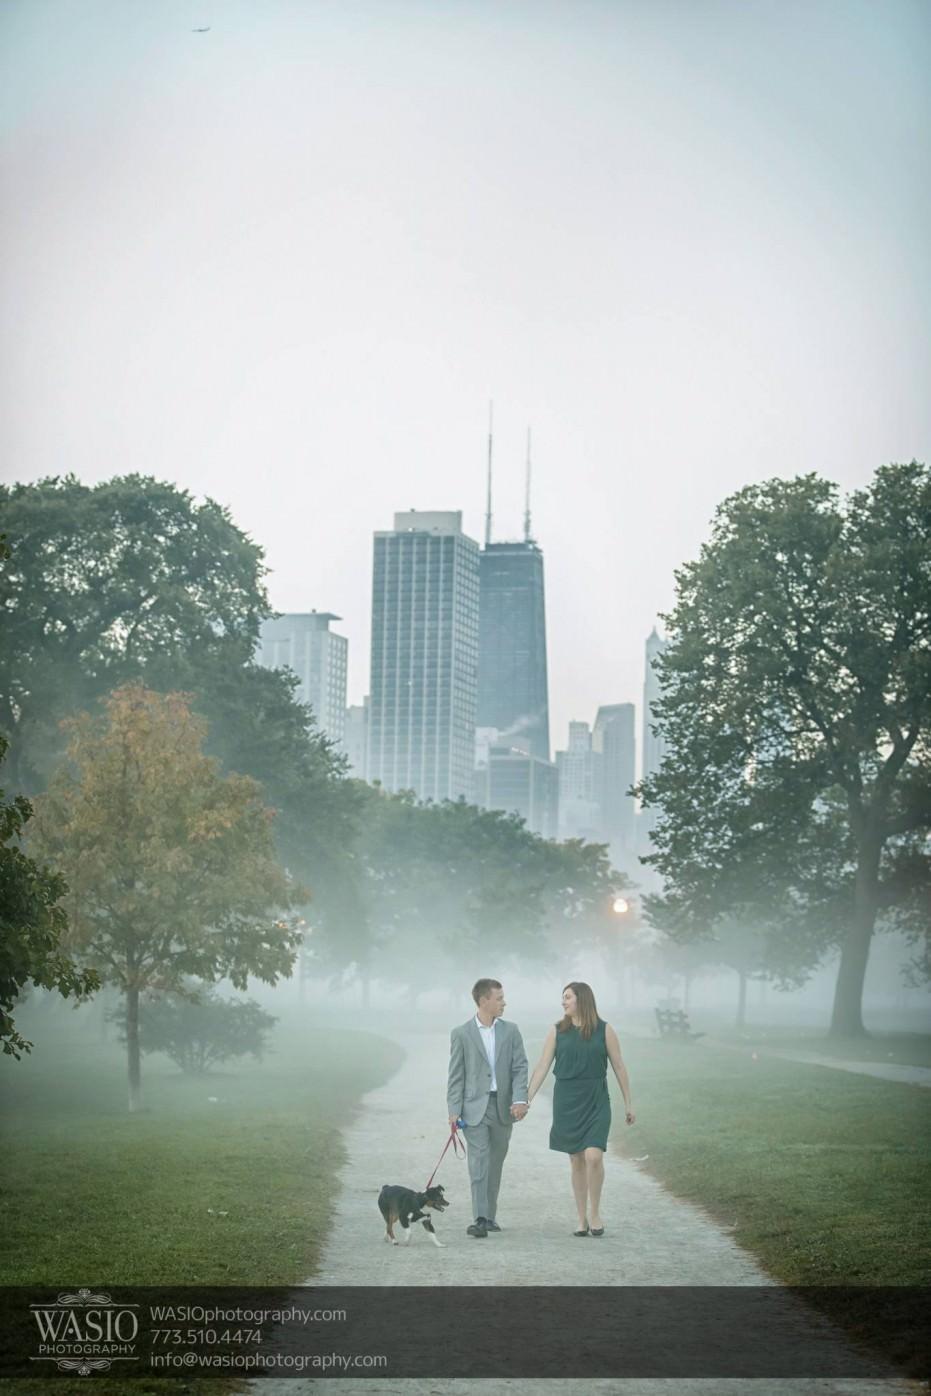 Chicago-sunrise-engagement-fog-puppy-walking-hancock-skyline-sunrise-dawn-046-931x1396 Chicago Sunrise Engagement - Dana & Nolan